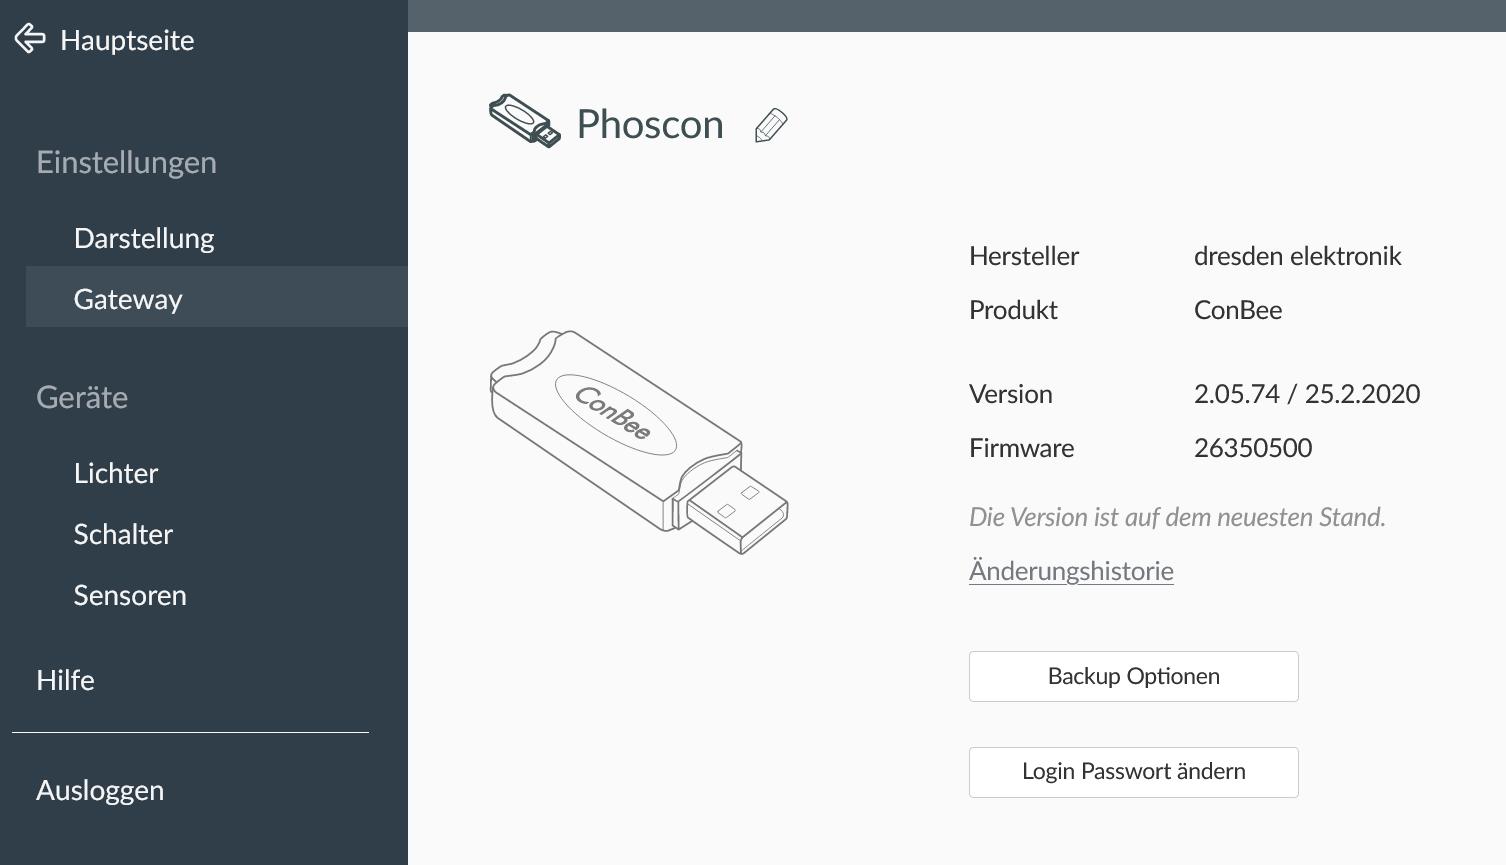 ConBee Adapter in Phoscon-Oberfläche